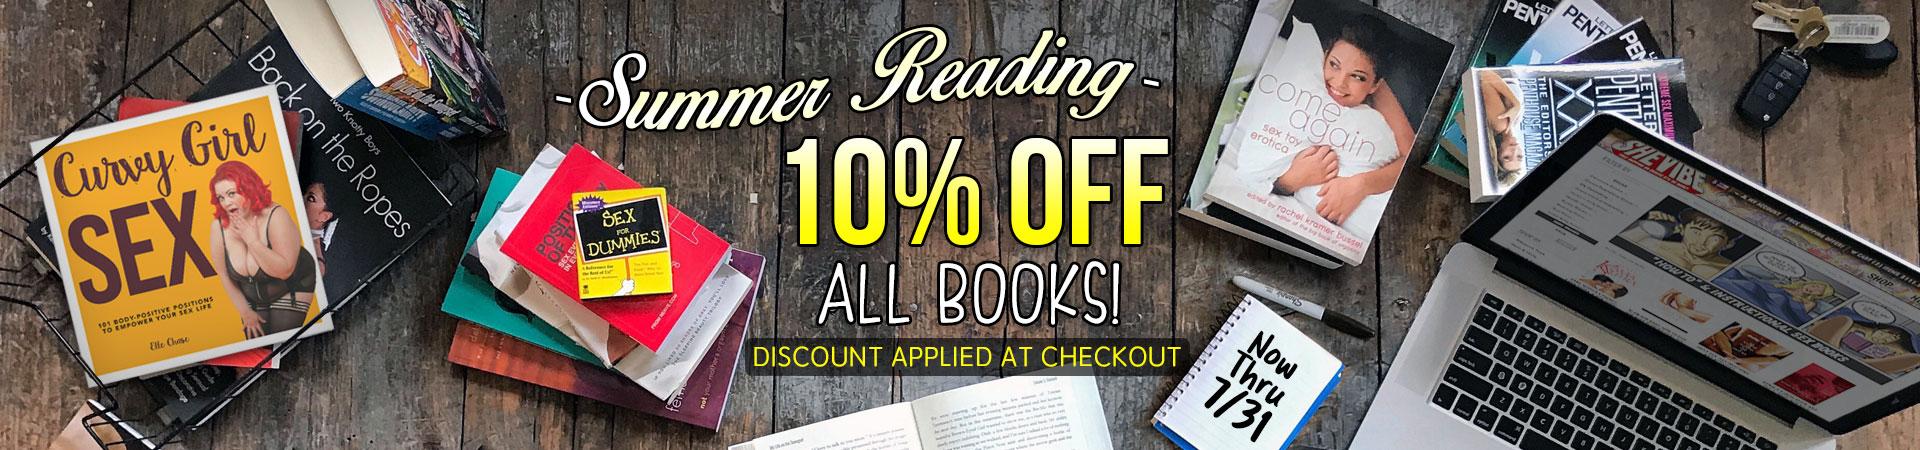 10% Off All Book - Now Thru 7/31